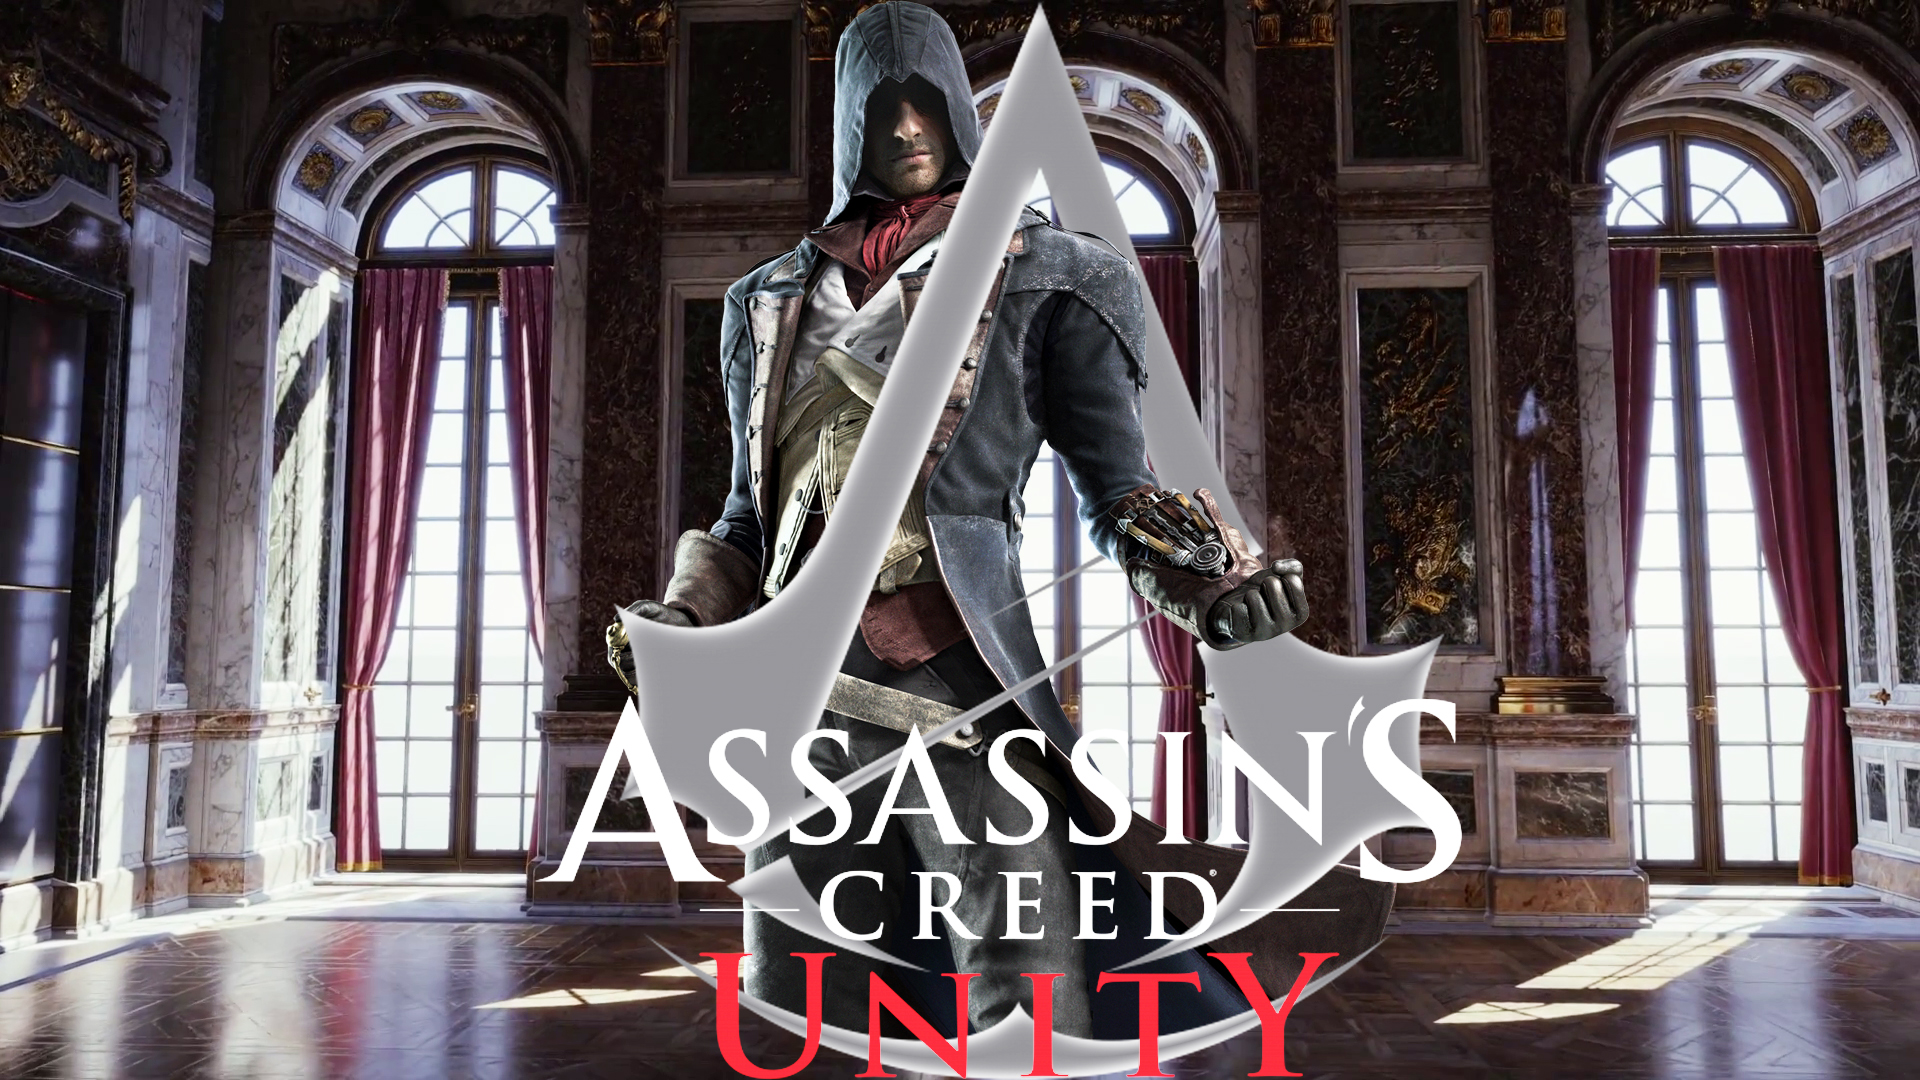 Assassin Creed 5 Unity Hd Wallpaper By Rajivcr7 On Deviantart